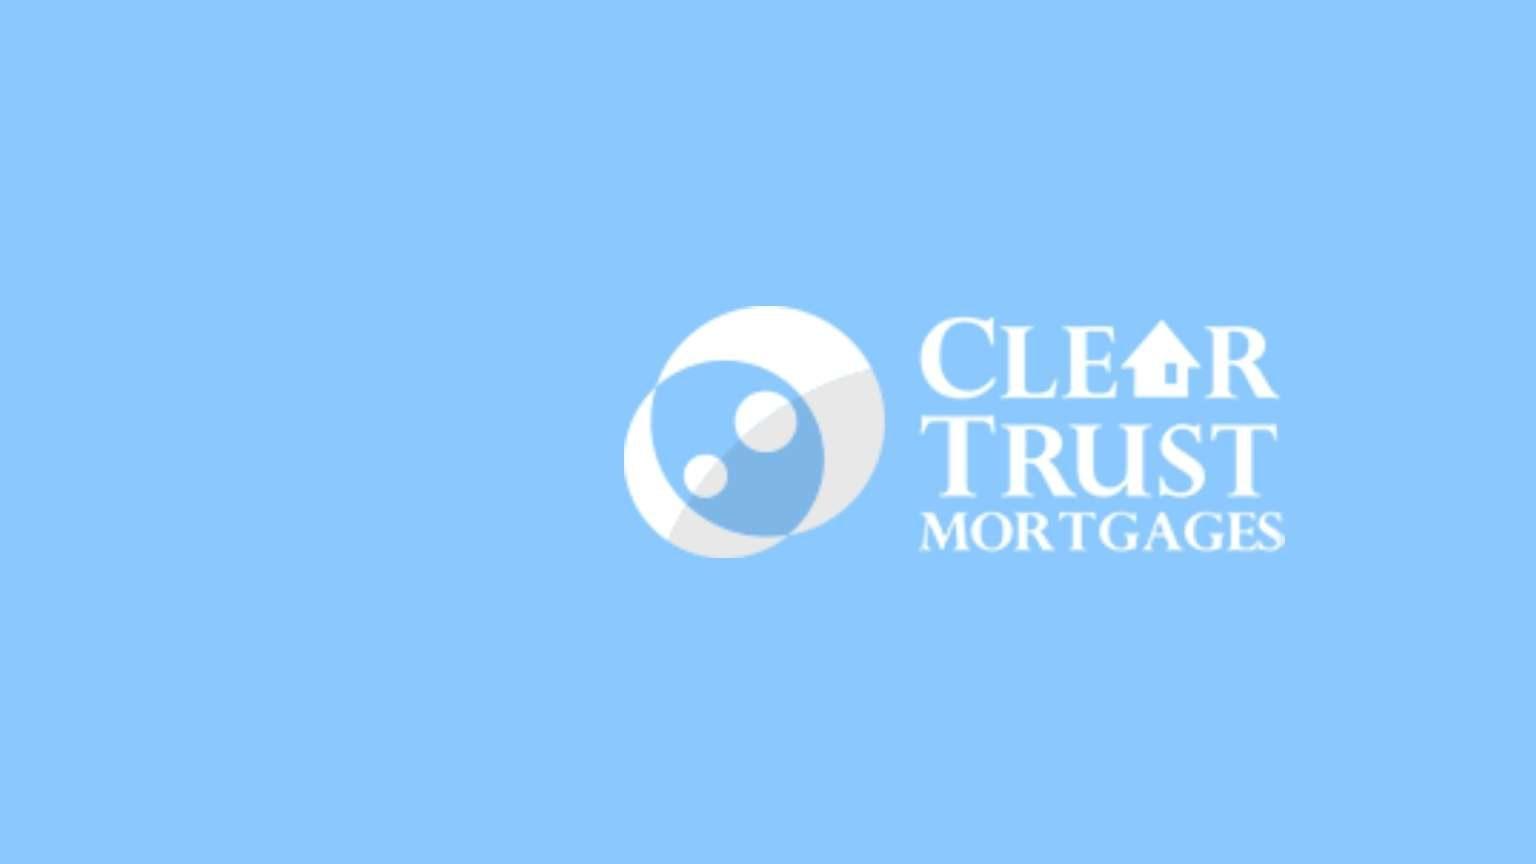 Clear trust